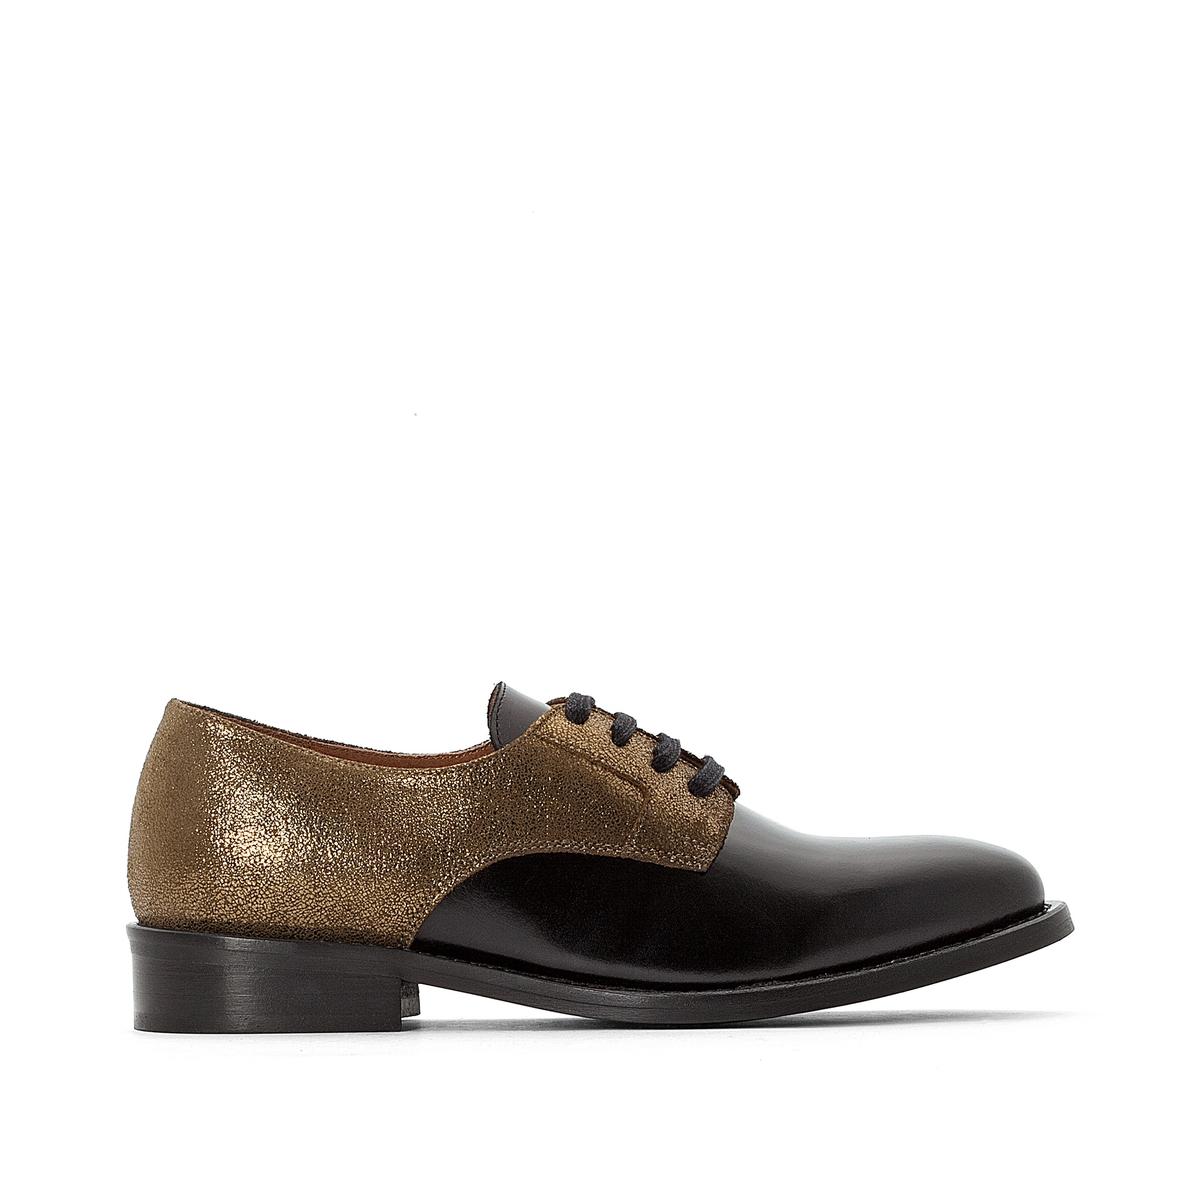 Ботинки-дерби из кожи Эксклюзив от La Redoute ботинки дерби из кожи dagonet